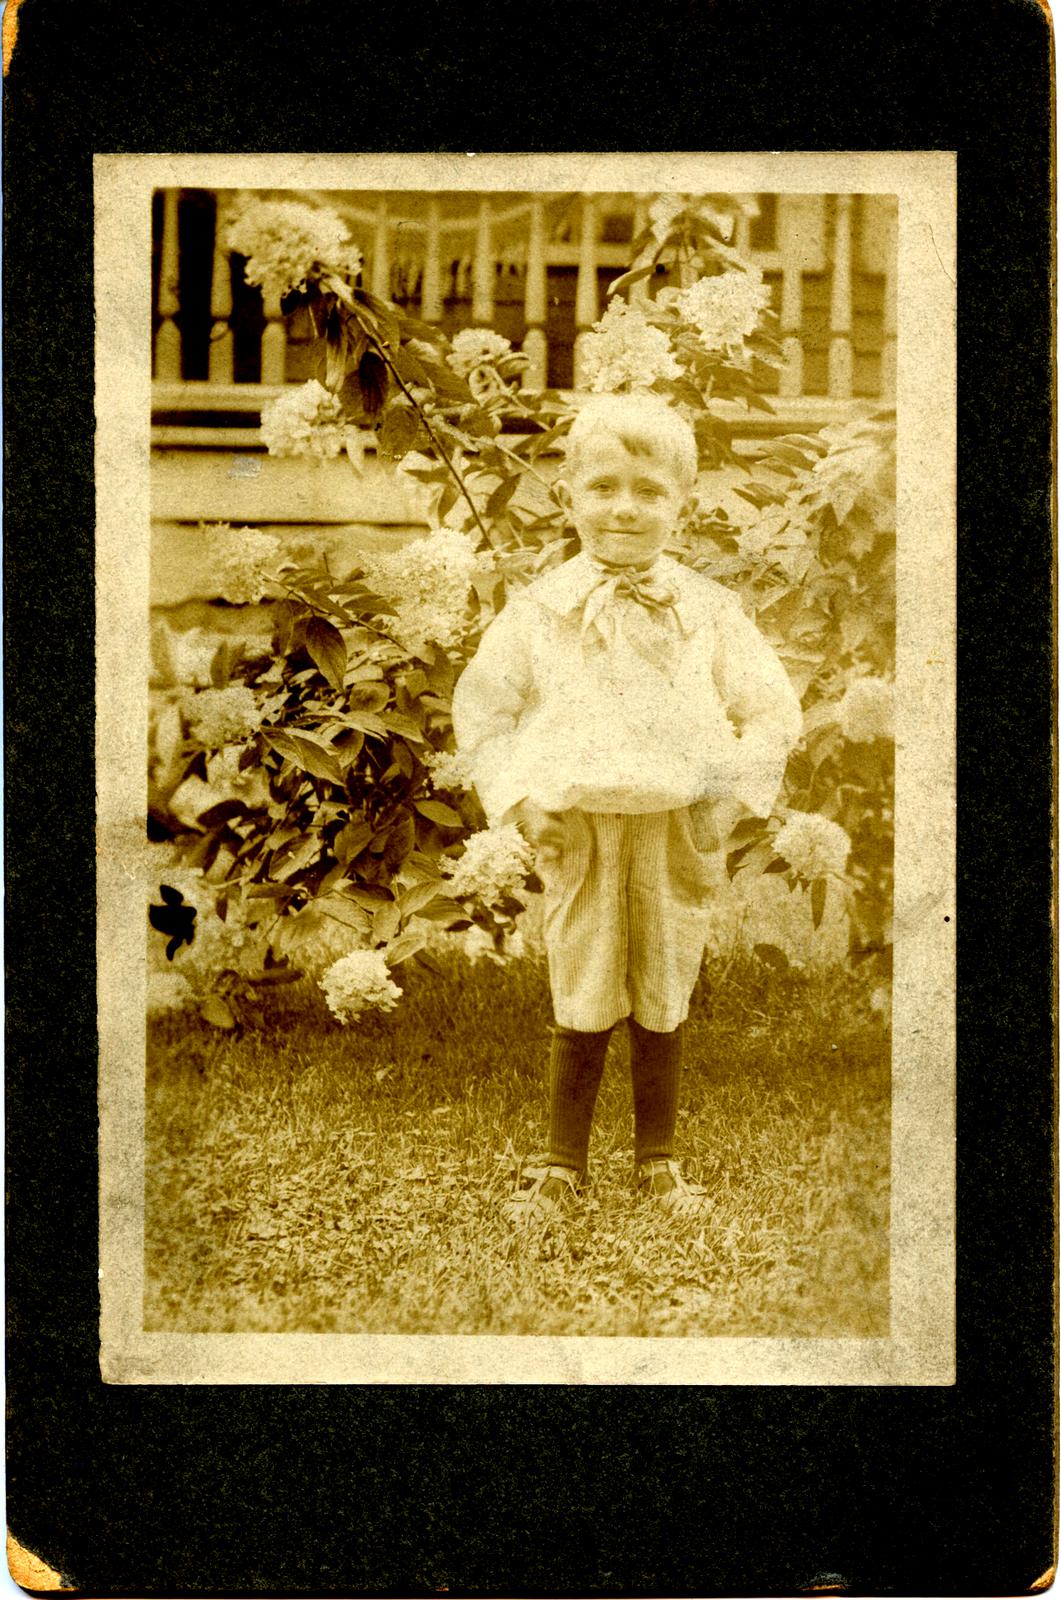 edward-m-betz-1907_en_large